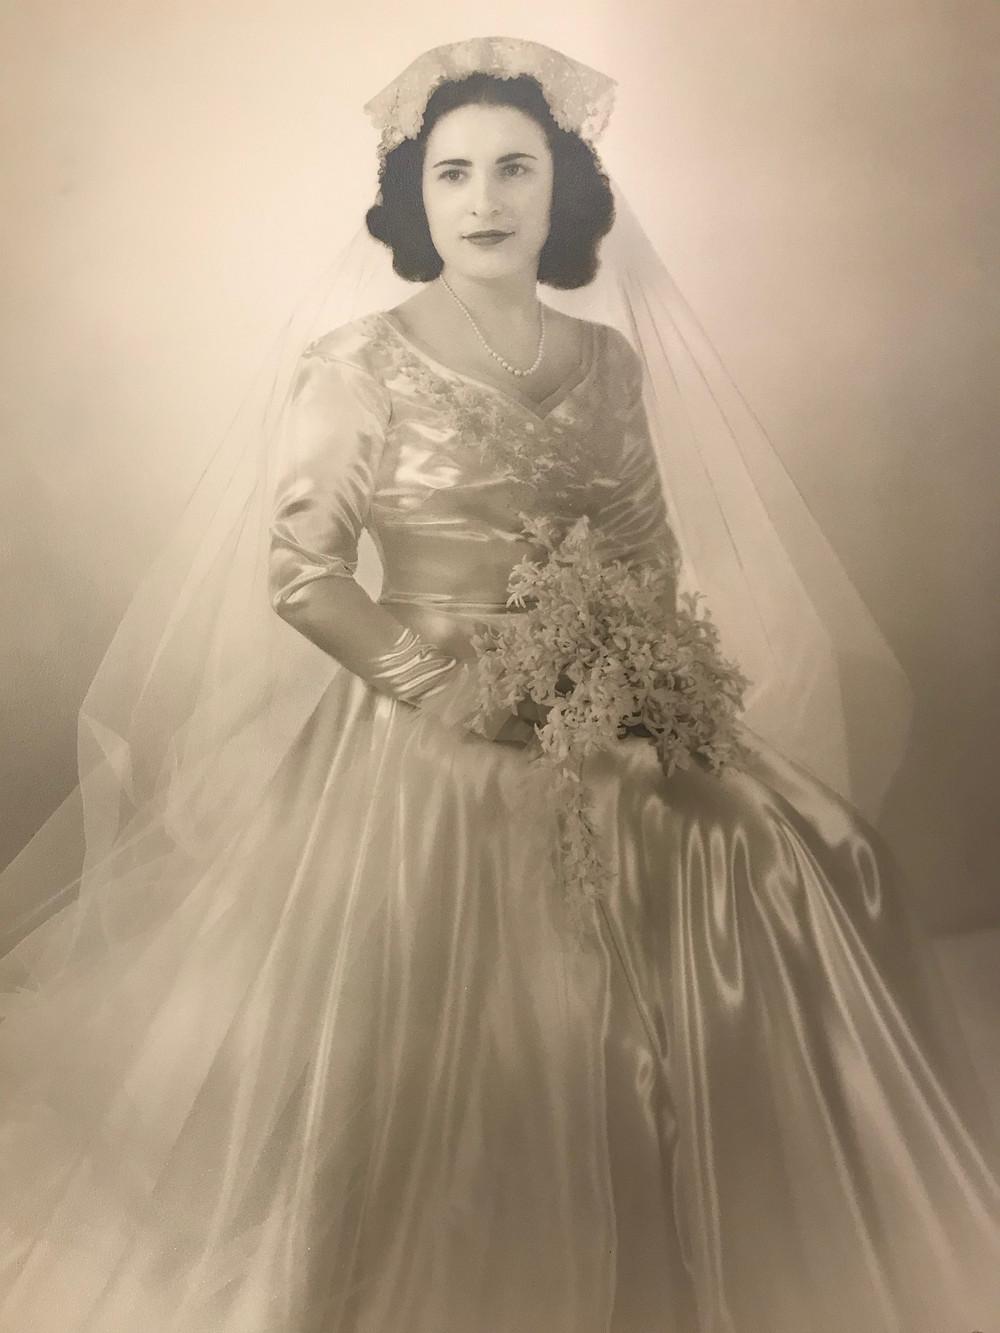 Grandmom Mary on her wedding day